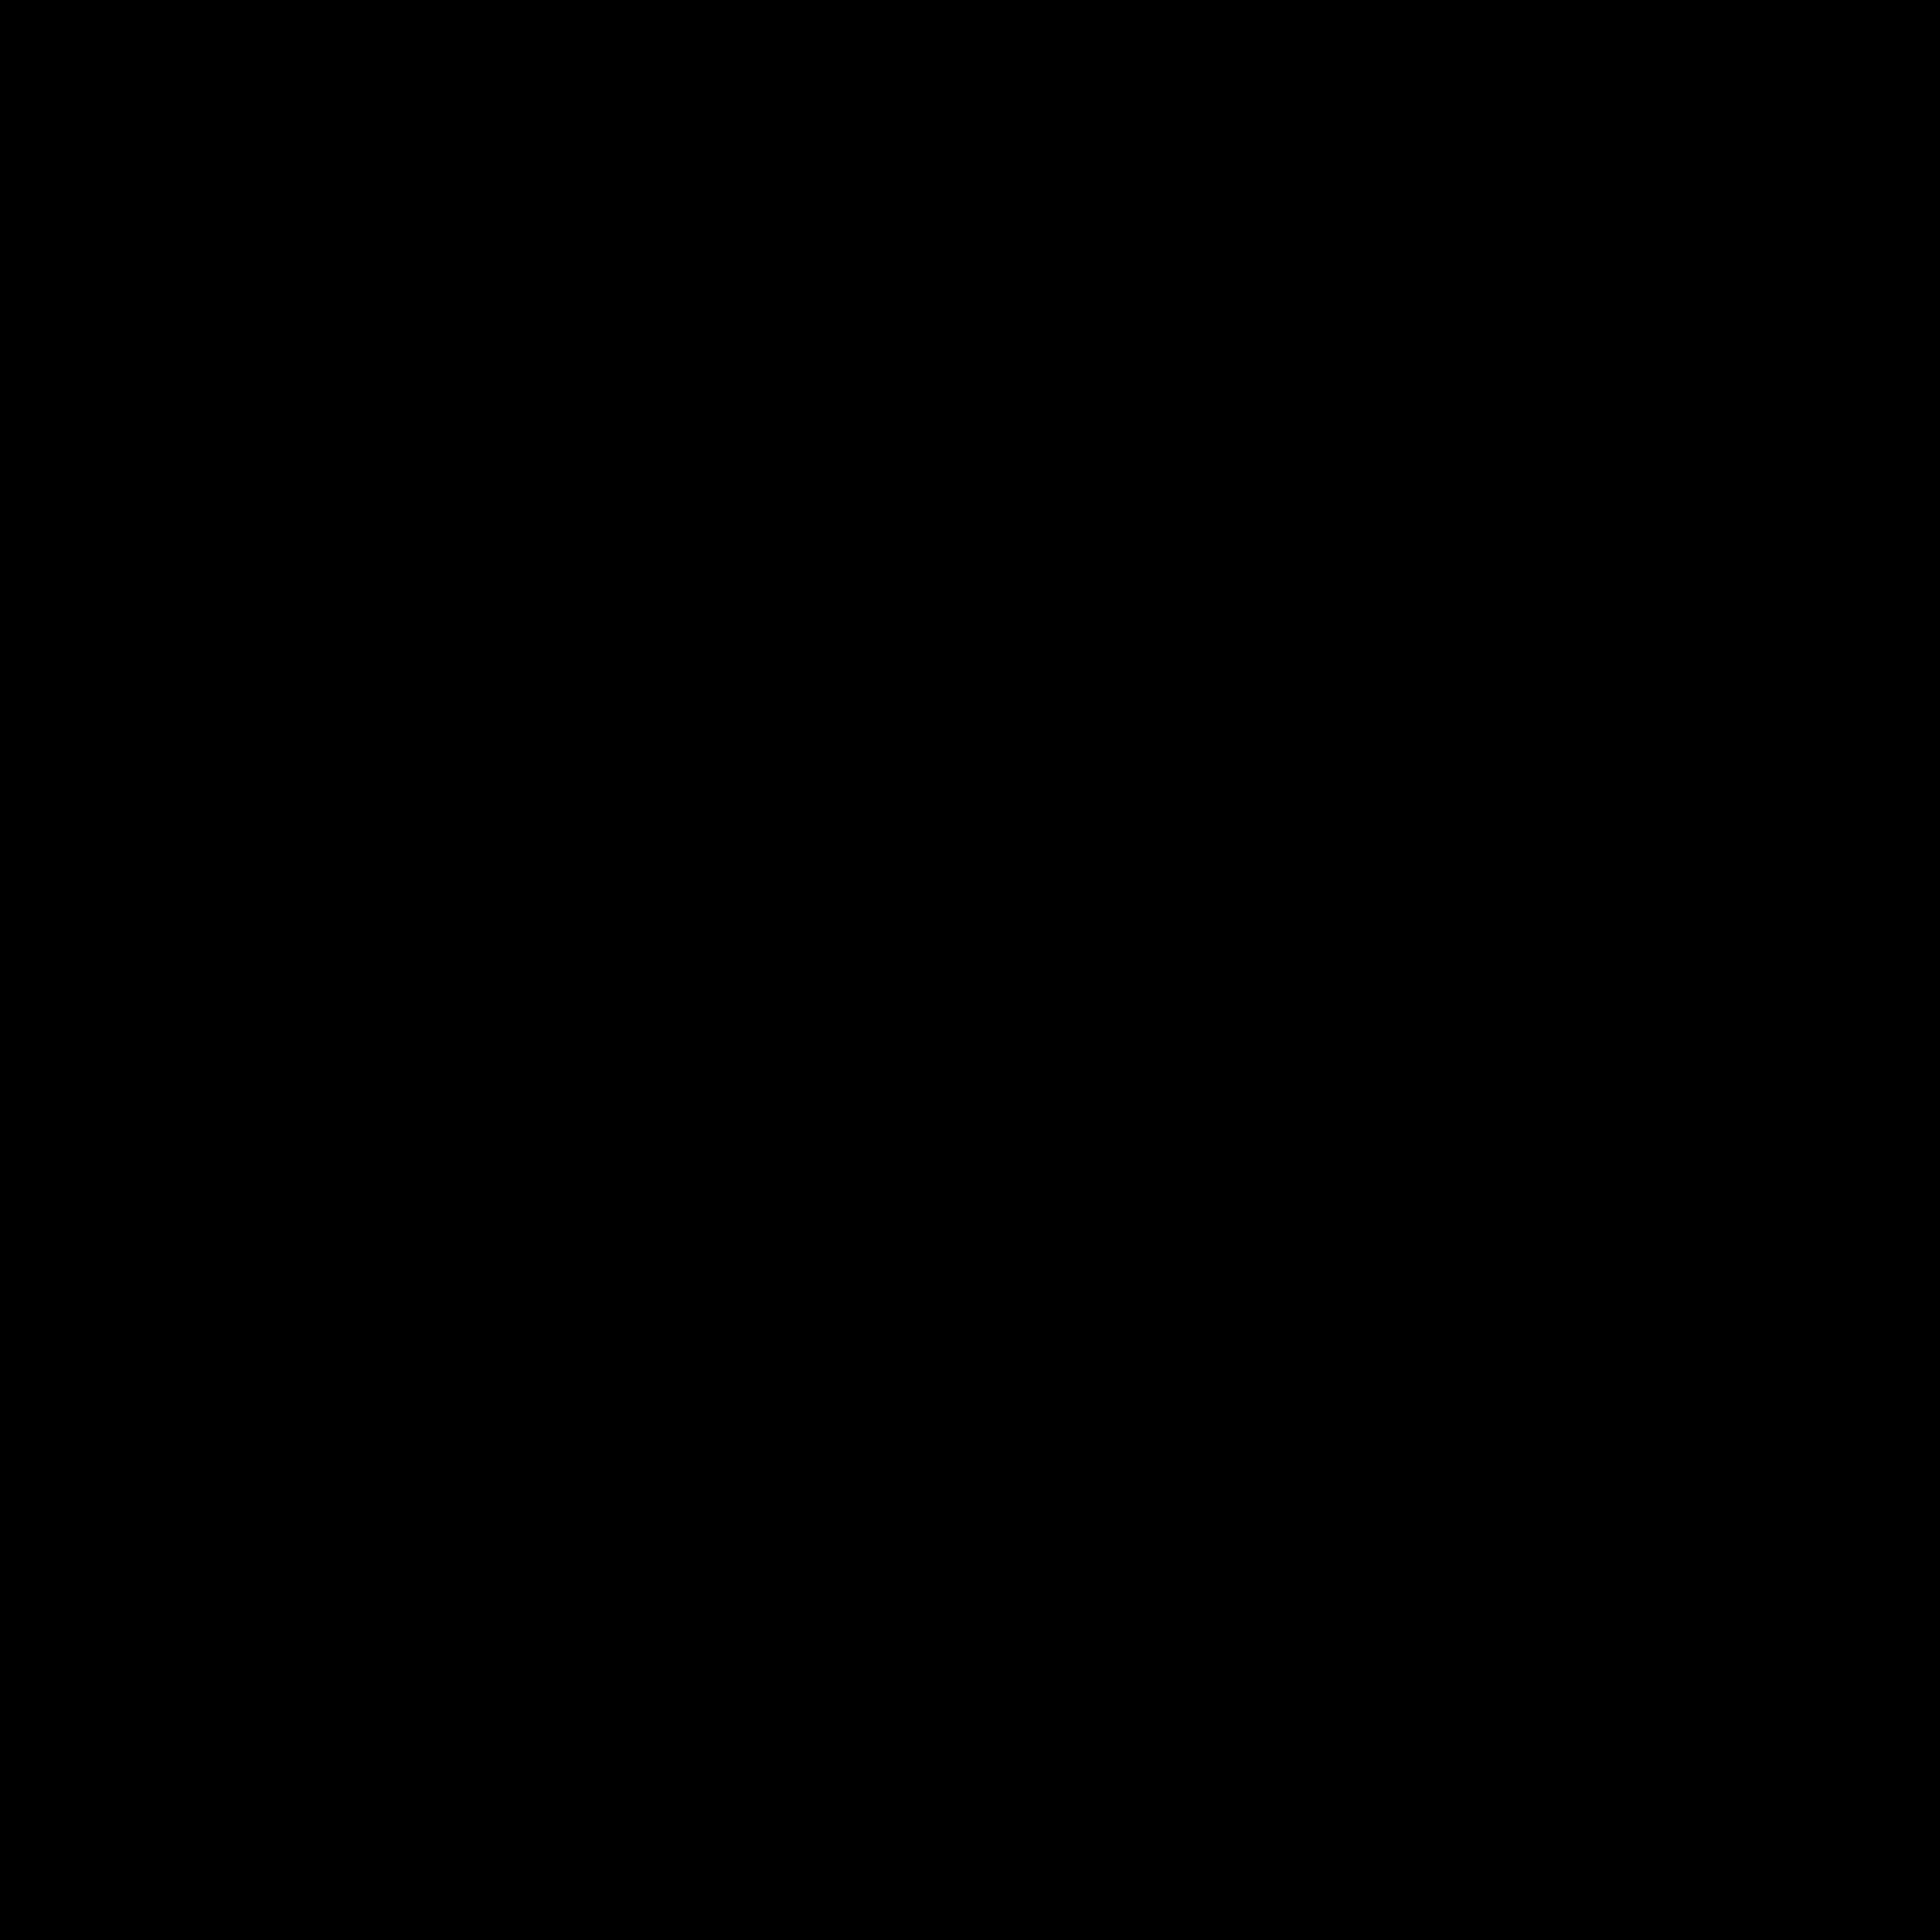 kaeser logo piemme nolo